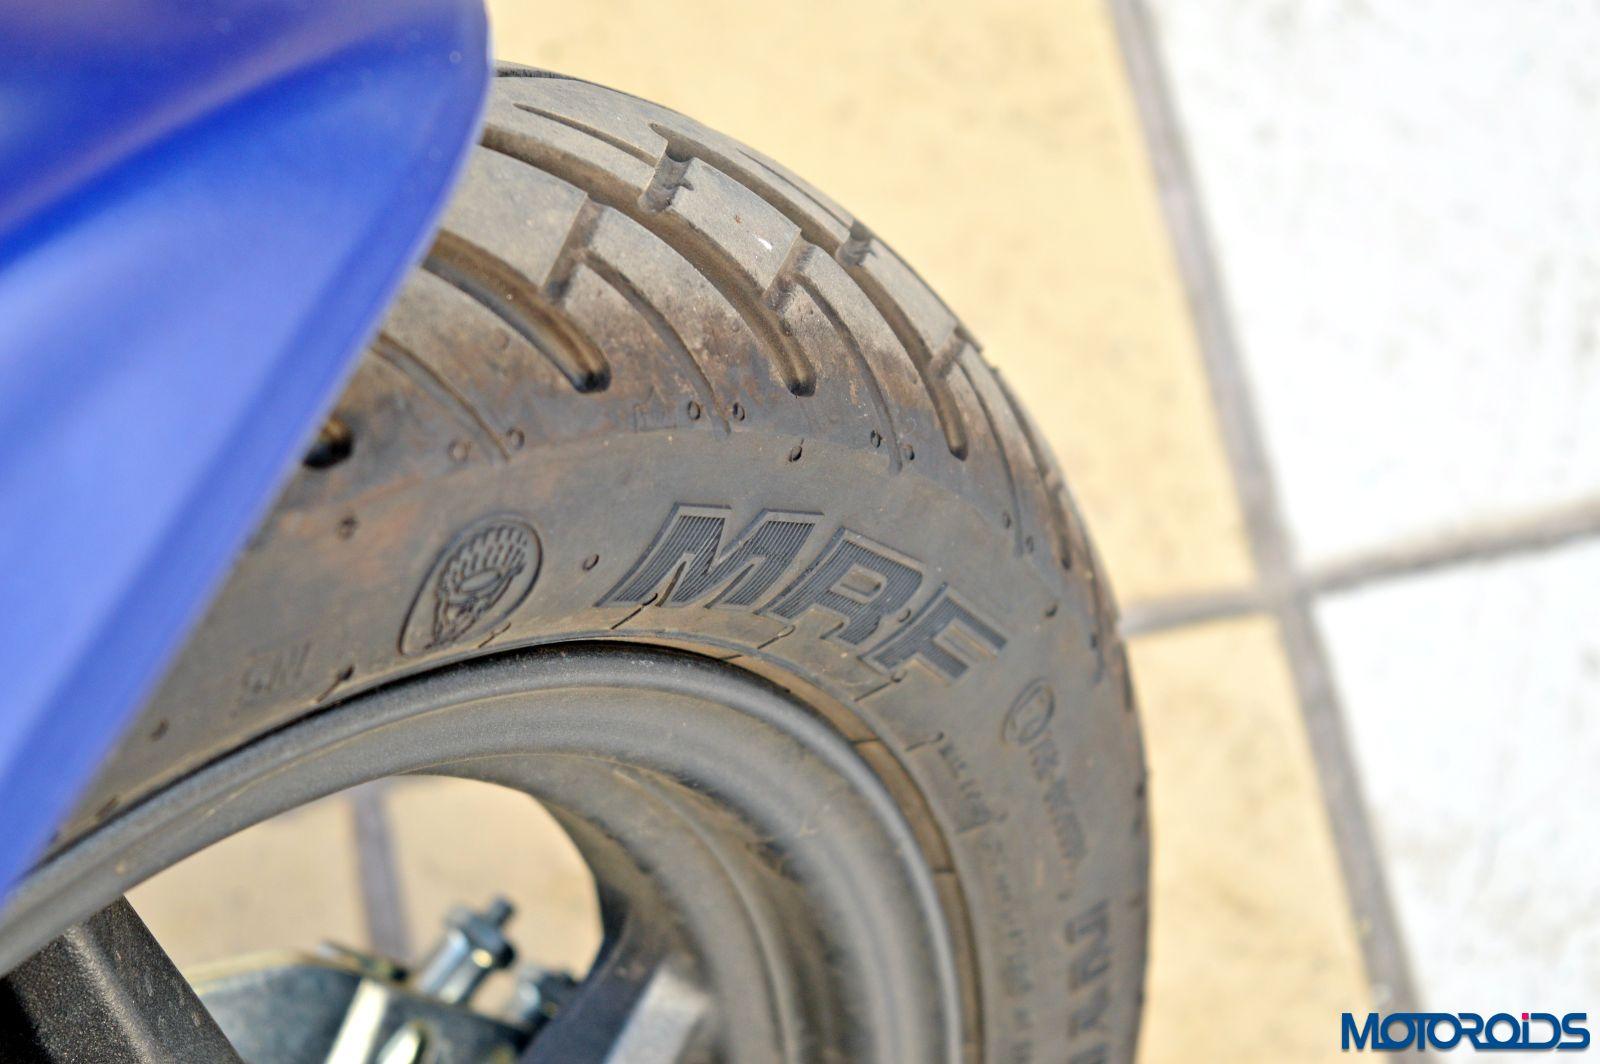 Hero Maestro Edge - Review - Details - Tyre (1)